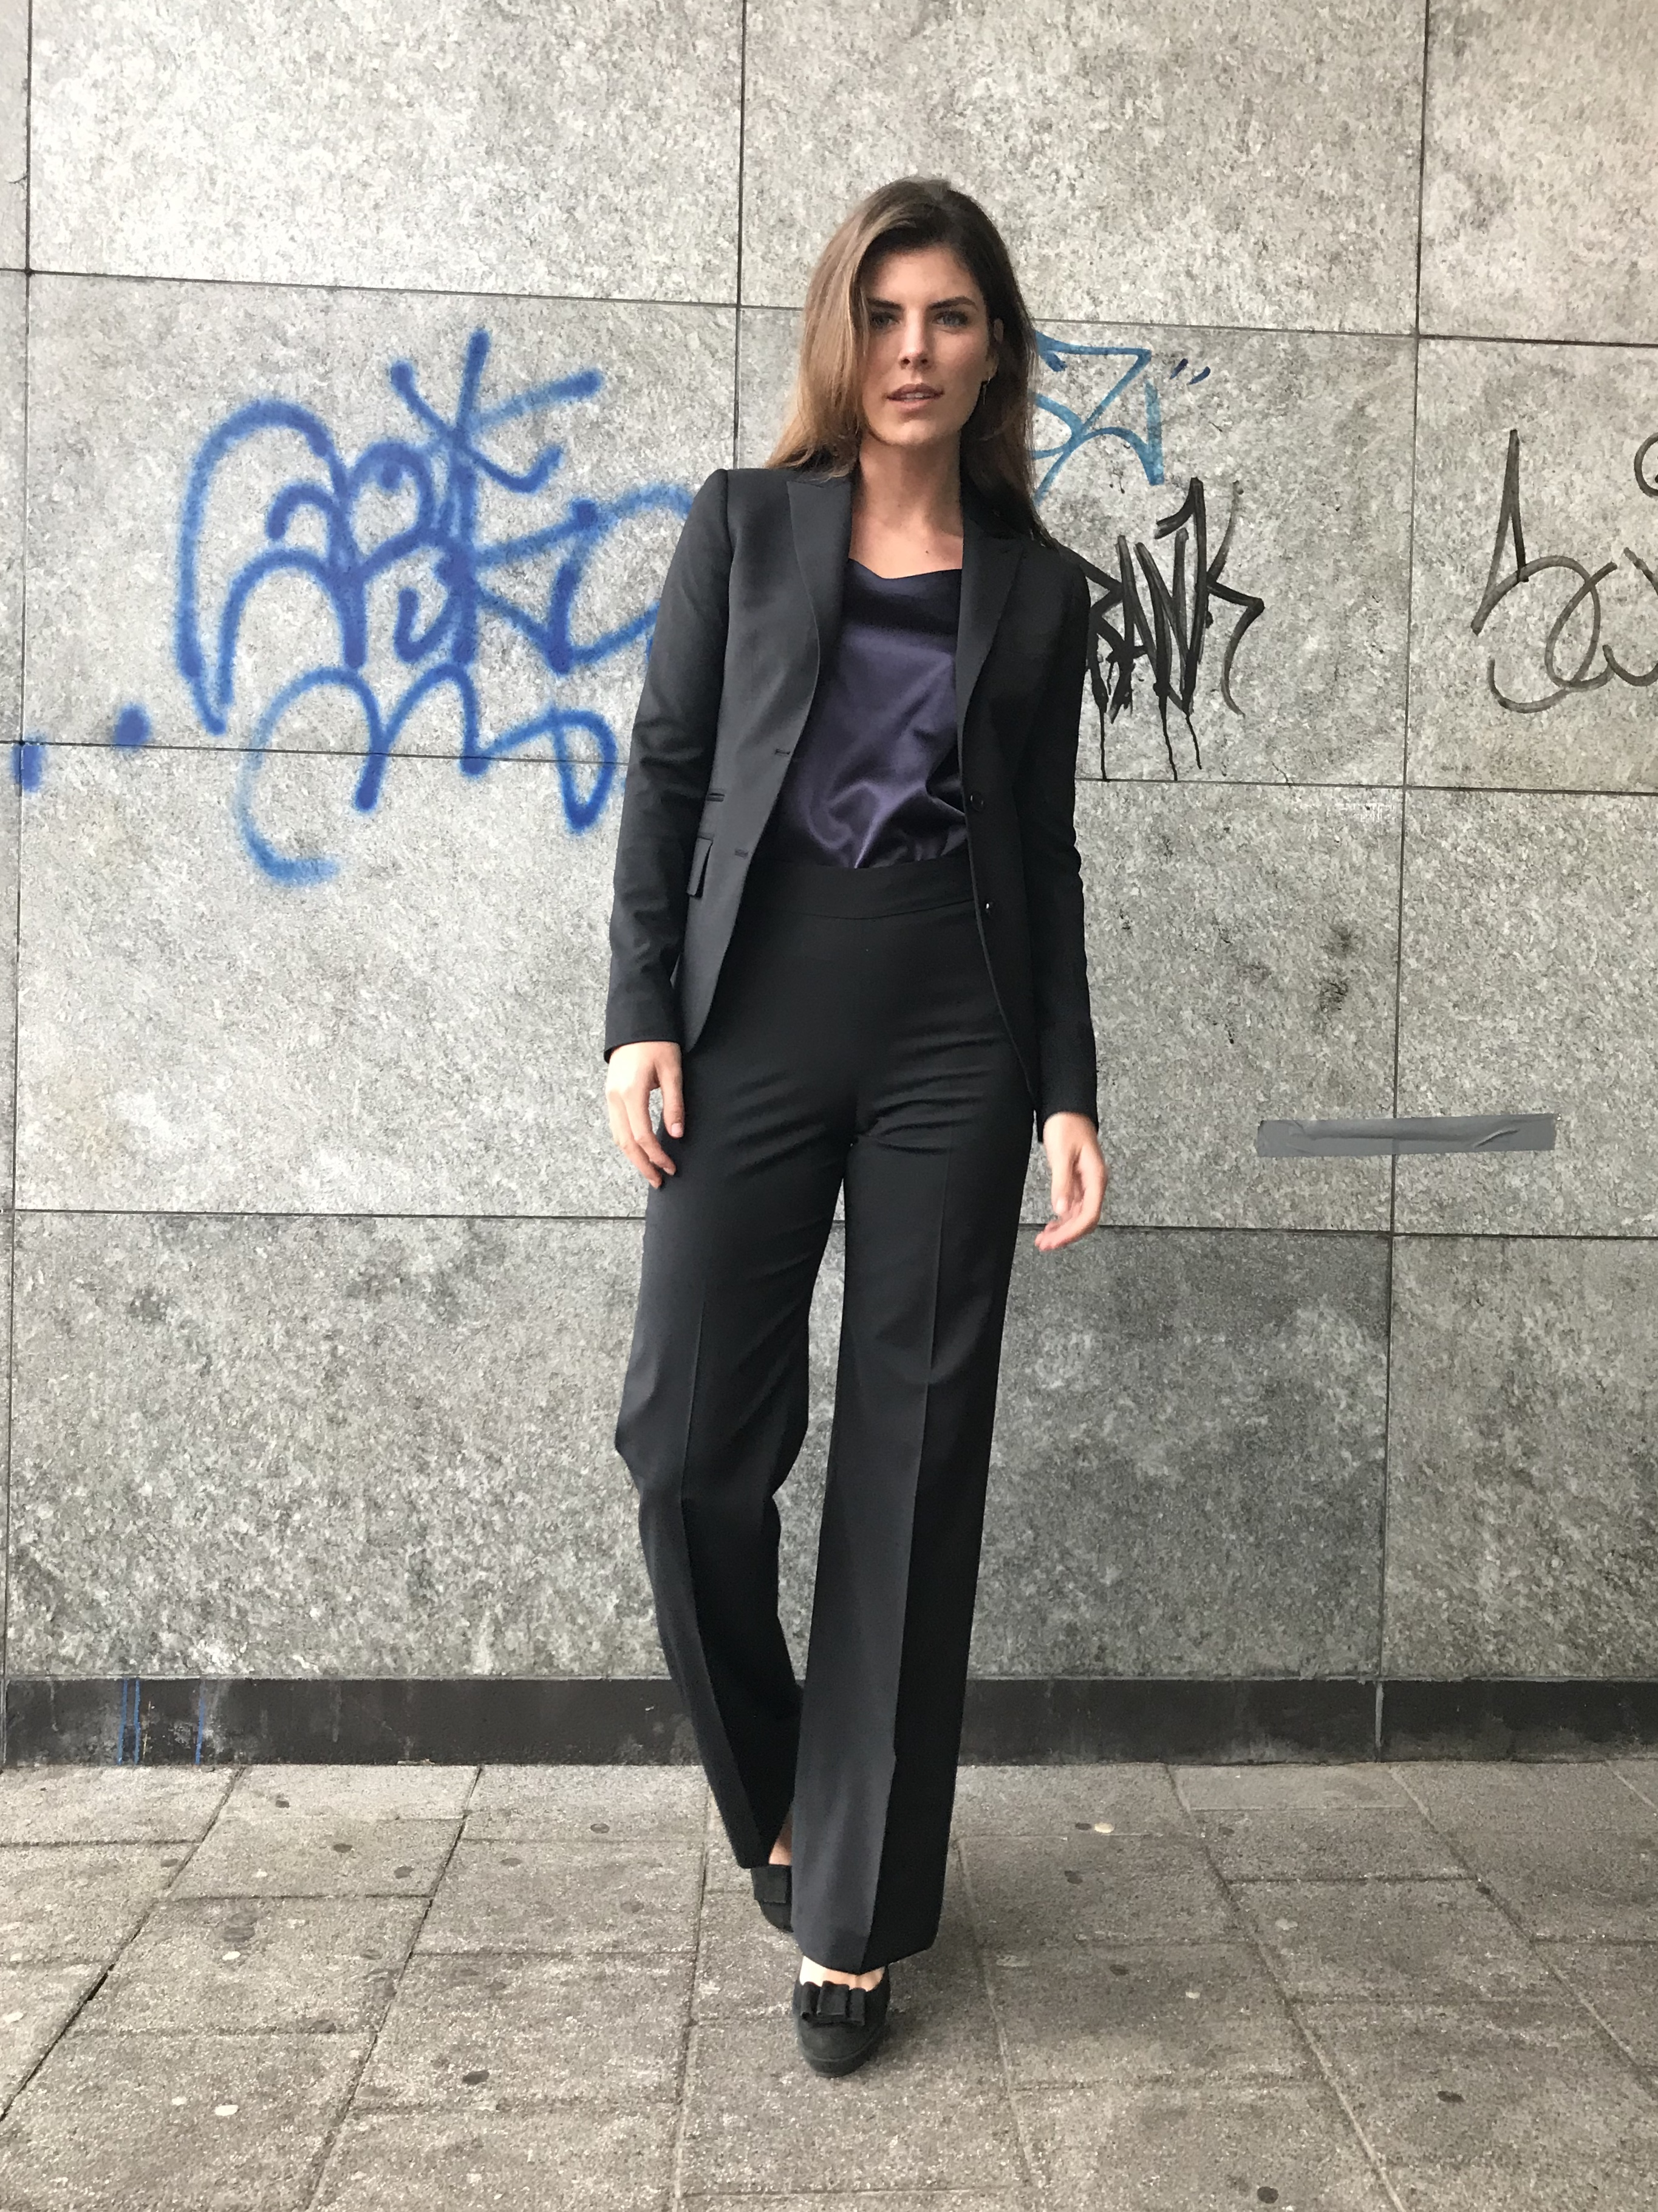 Fonkelnieuw Dames pak zwart flared pantalon FY-19